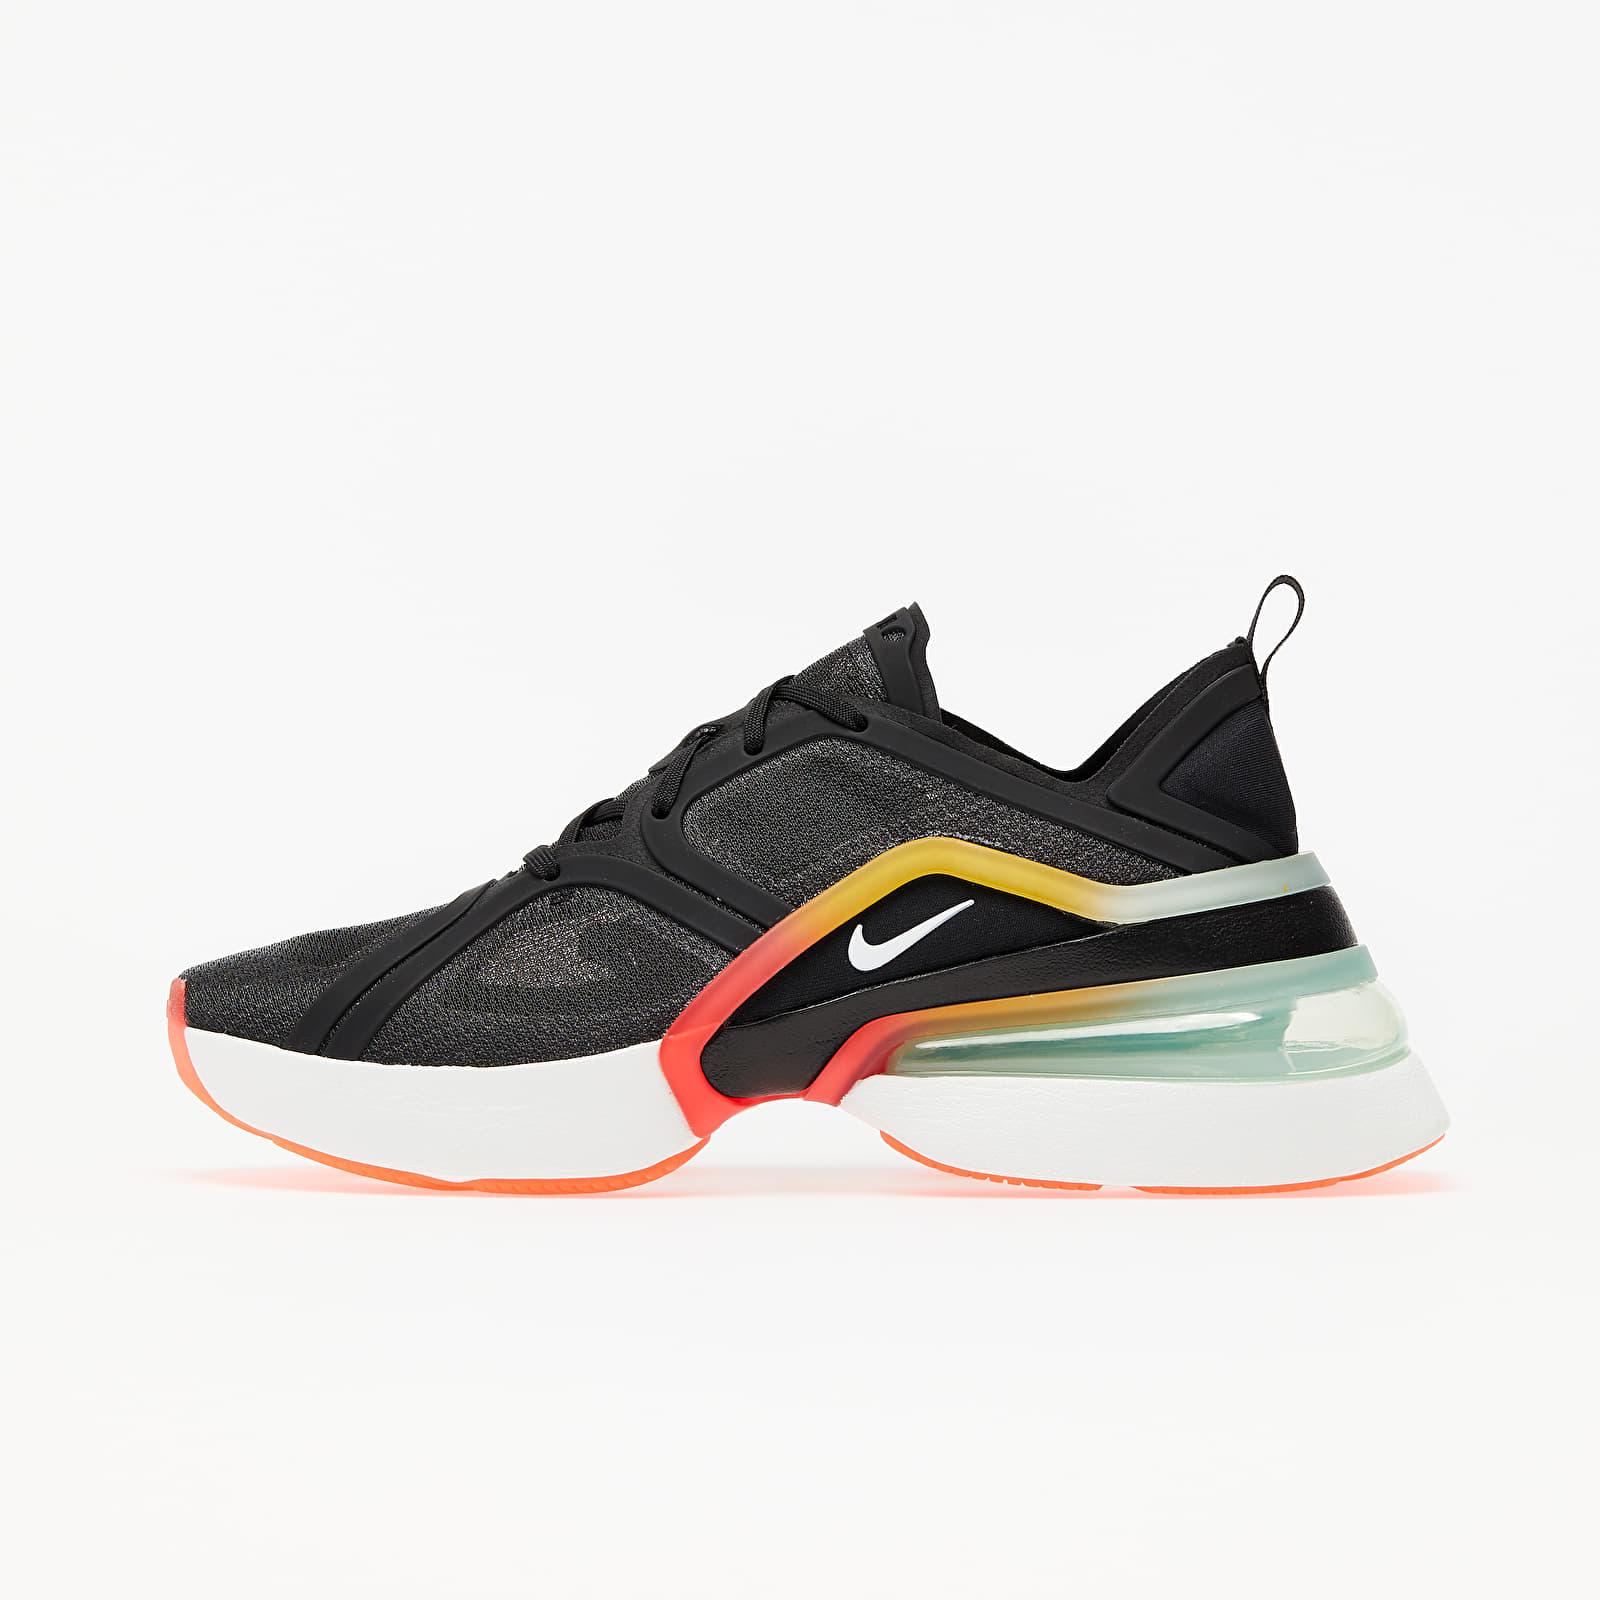 Women's shoes Nike W Air Max 270 XX Black/ White-Bright Crimson